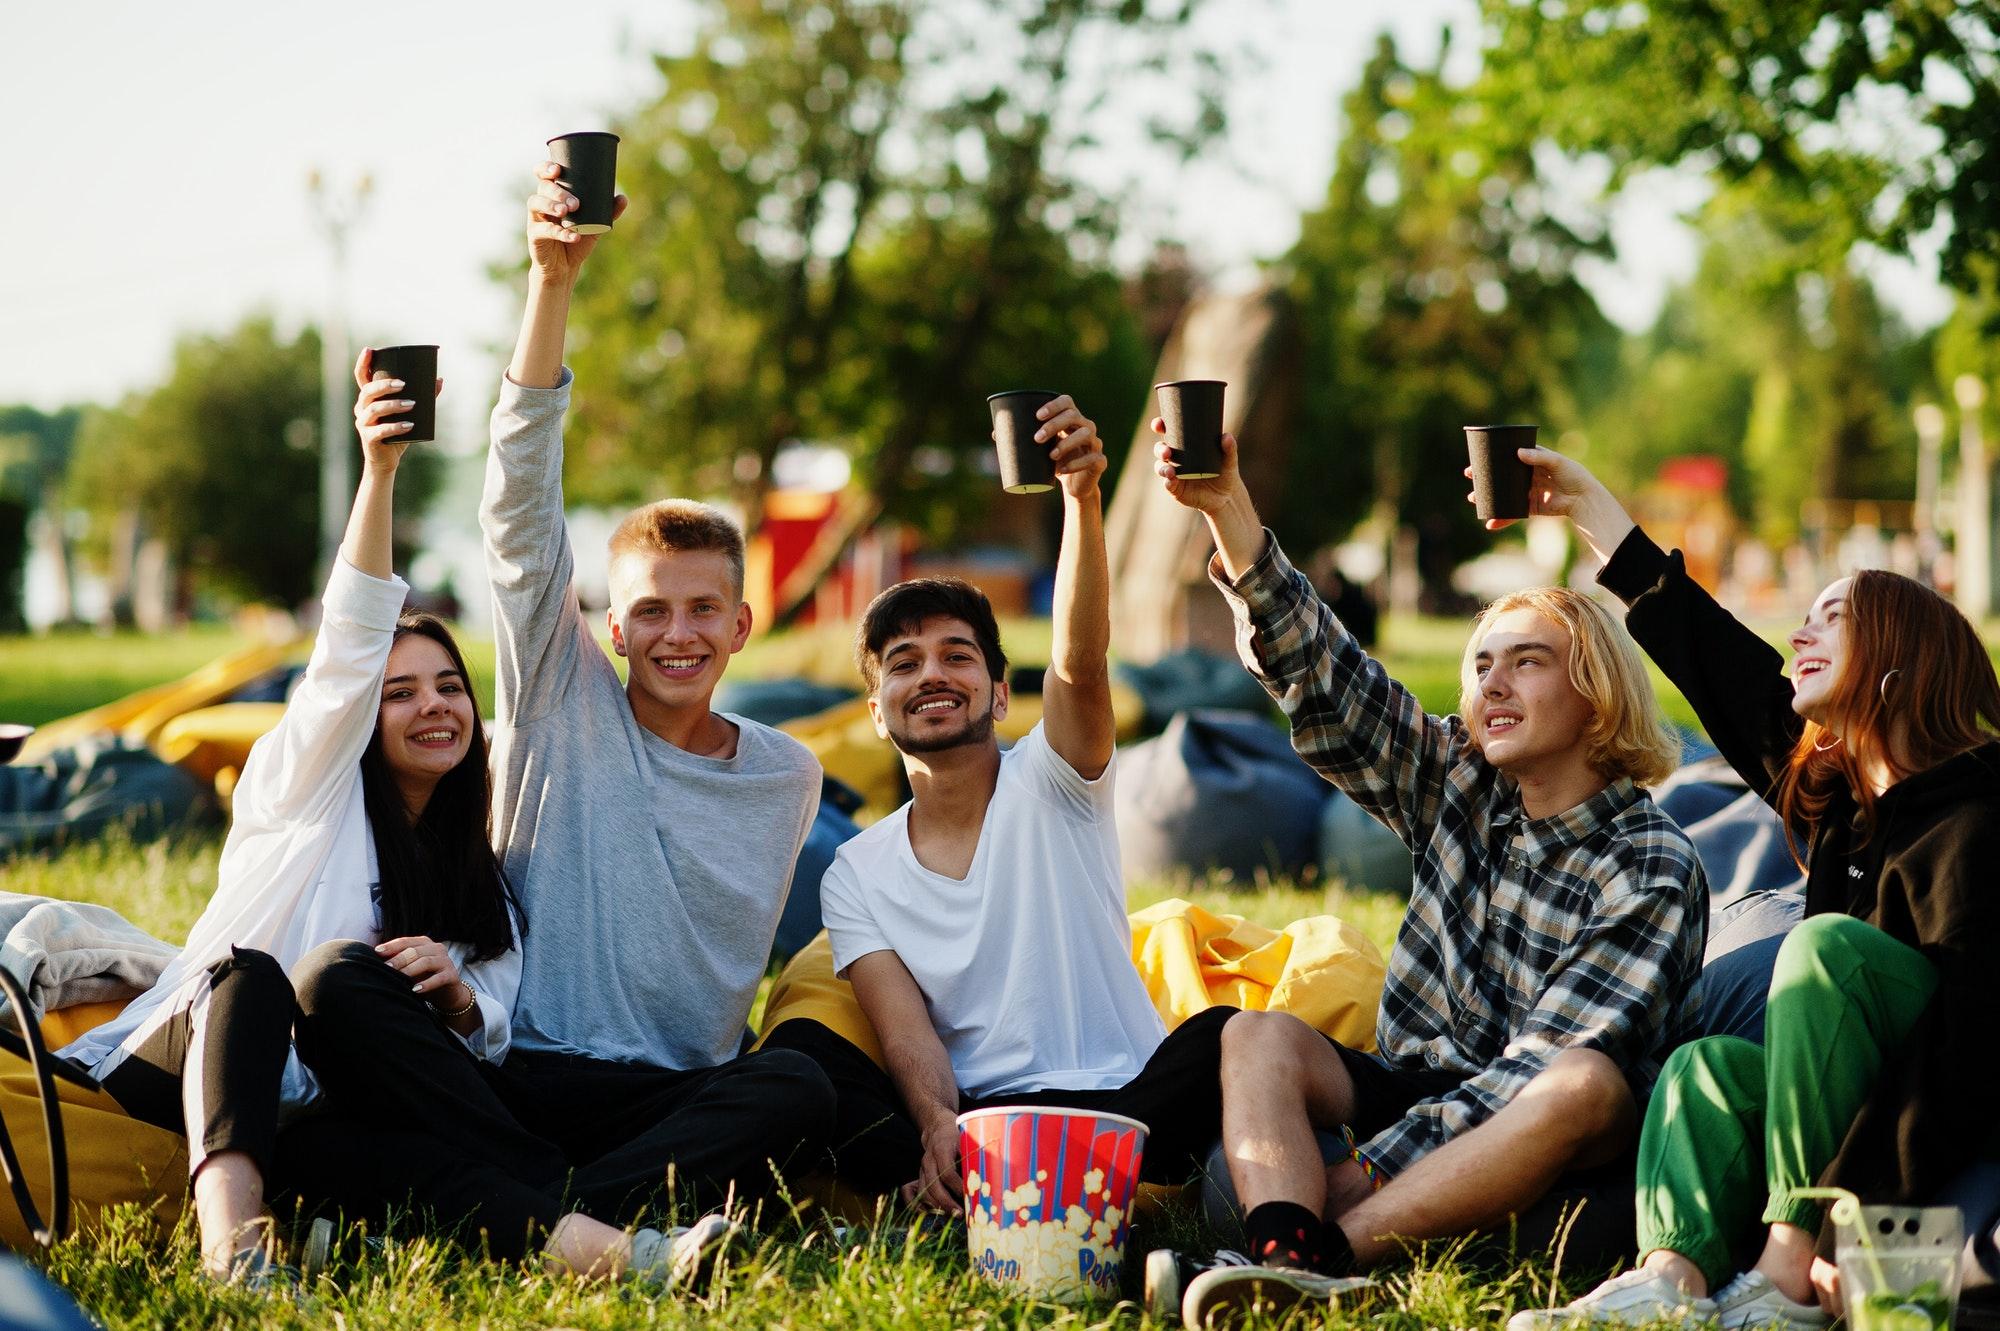 Open air cinema party